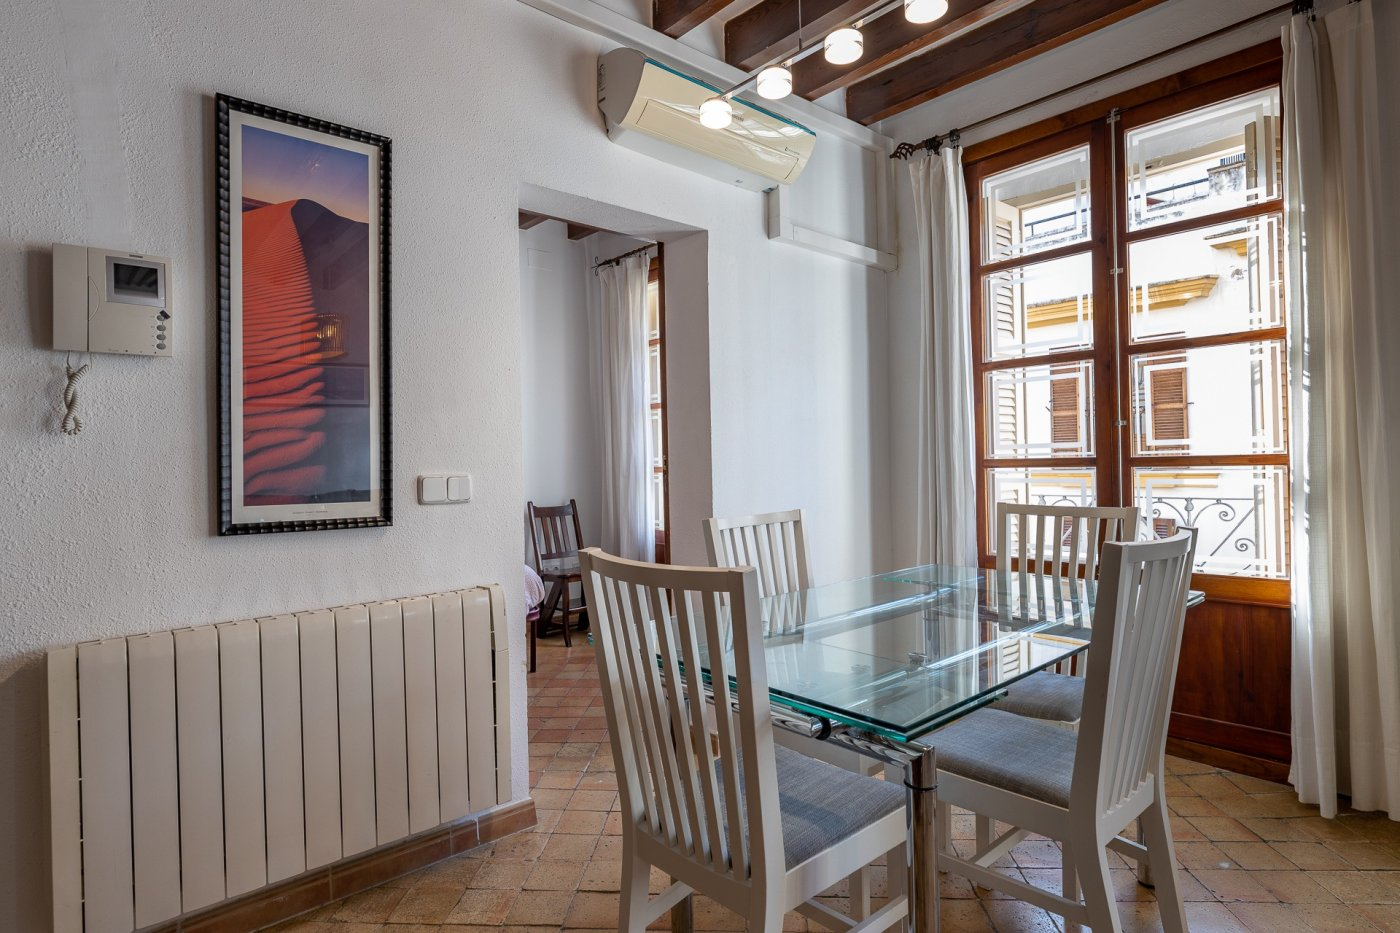 Espectacular apartamento en centro de palma - imagenInmueble26